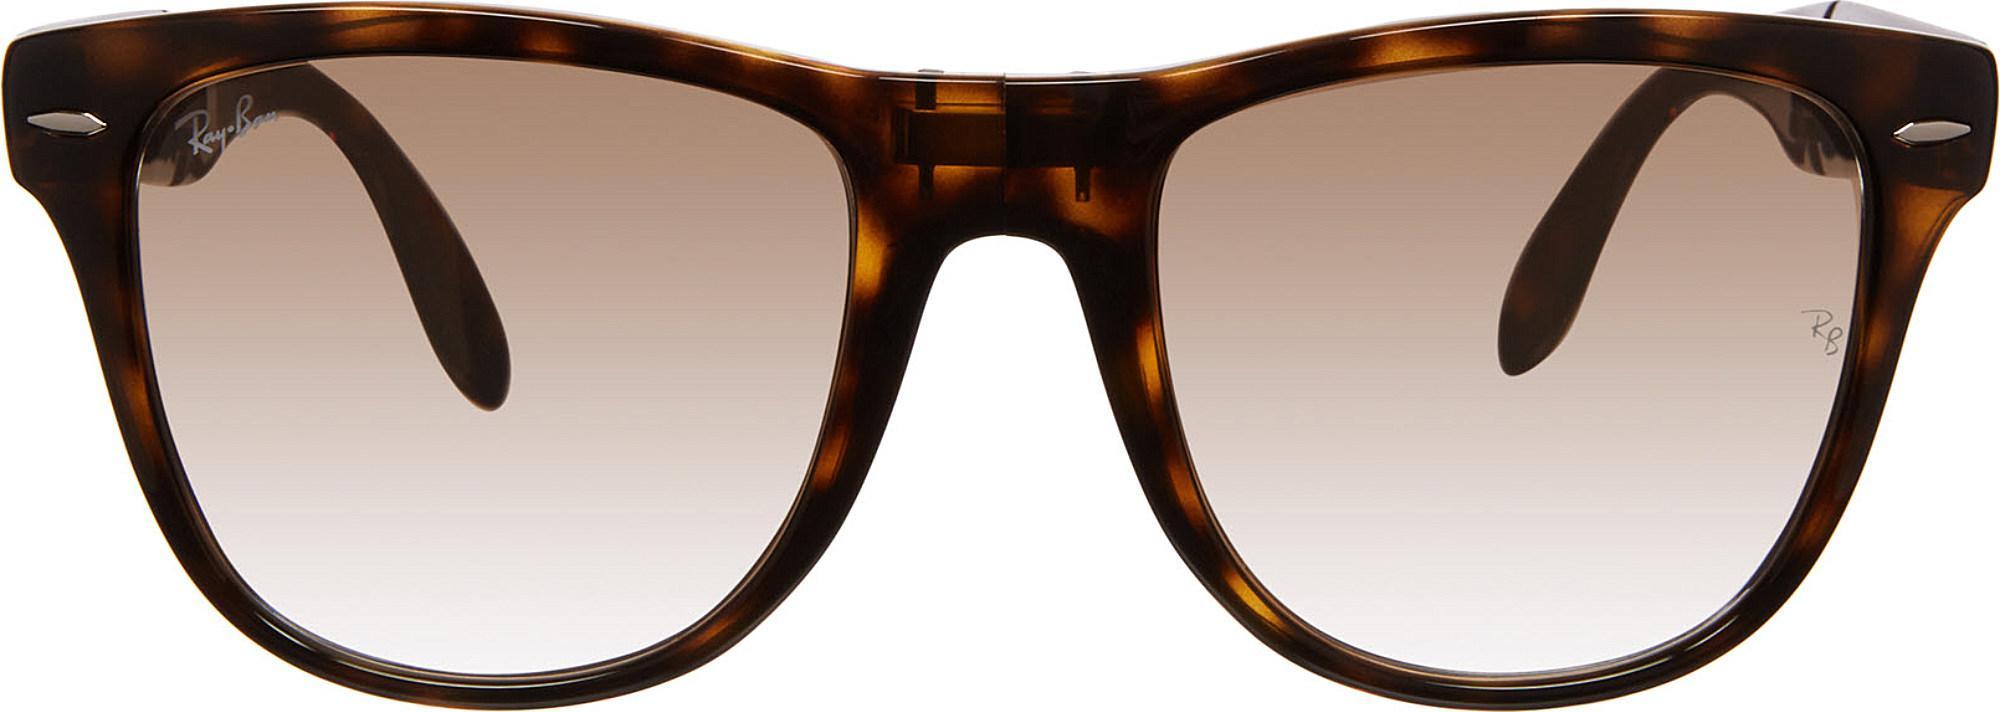 fe6f8e8c247f9 Ray-Ban. Women s Brown Wayfarer Folding Classic Square Sunglasses Rb4105 50